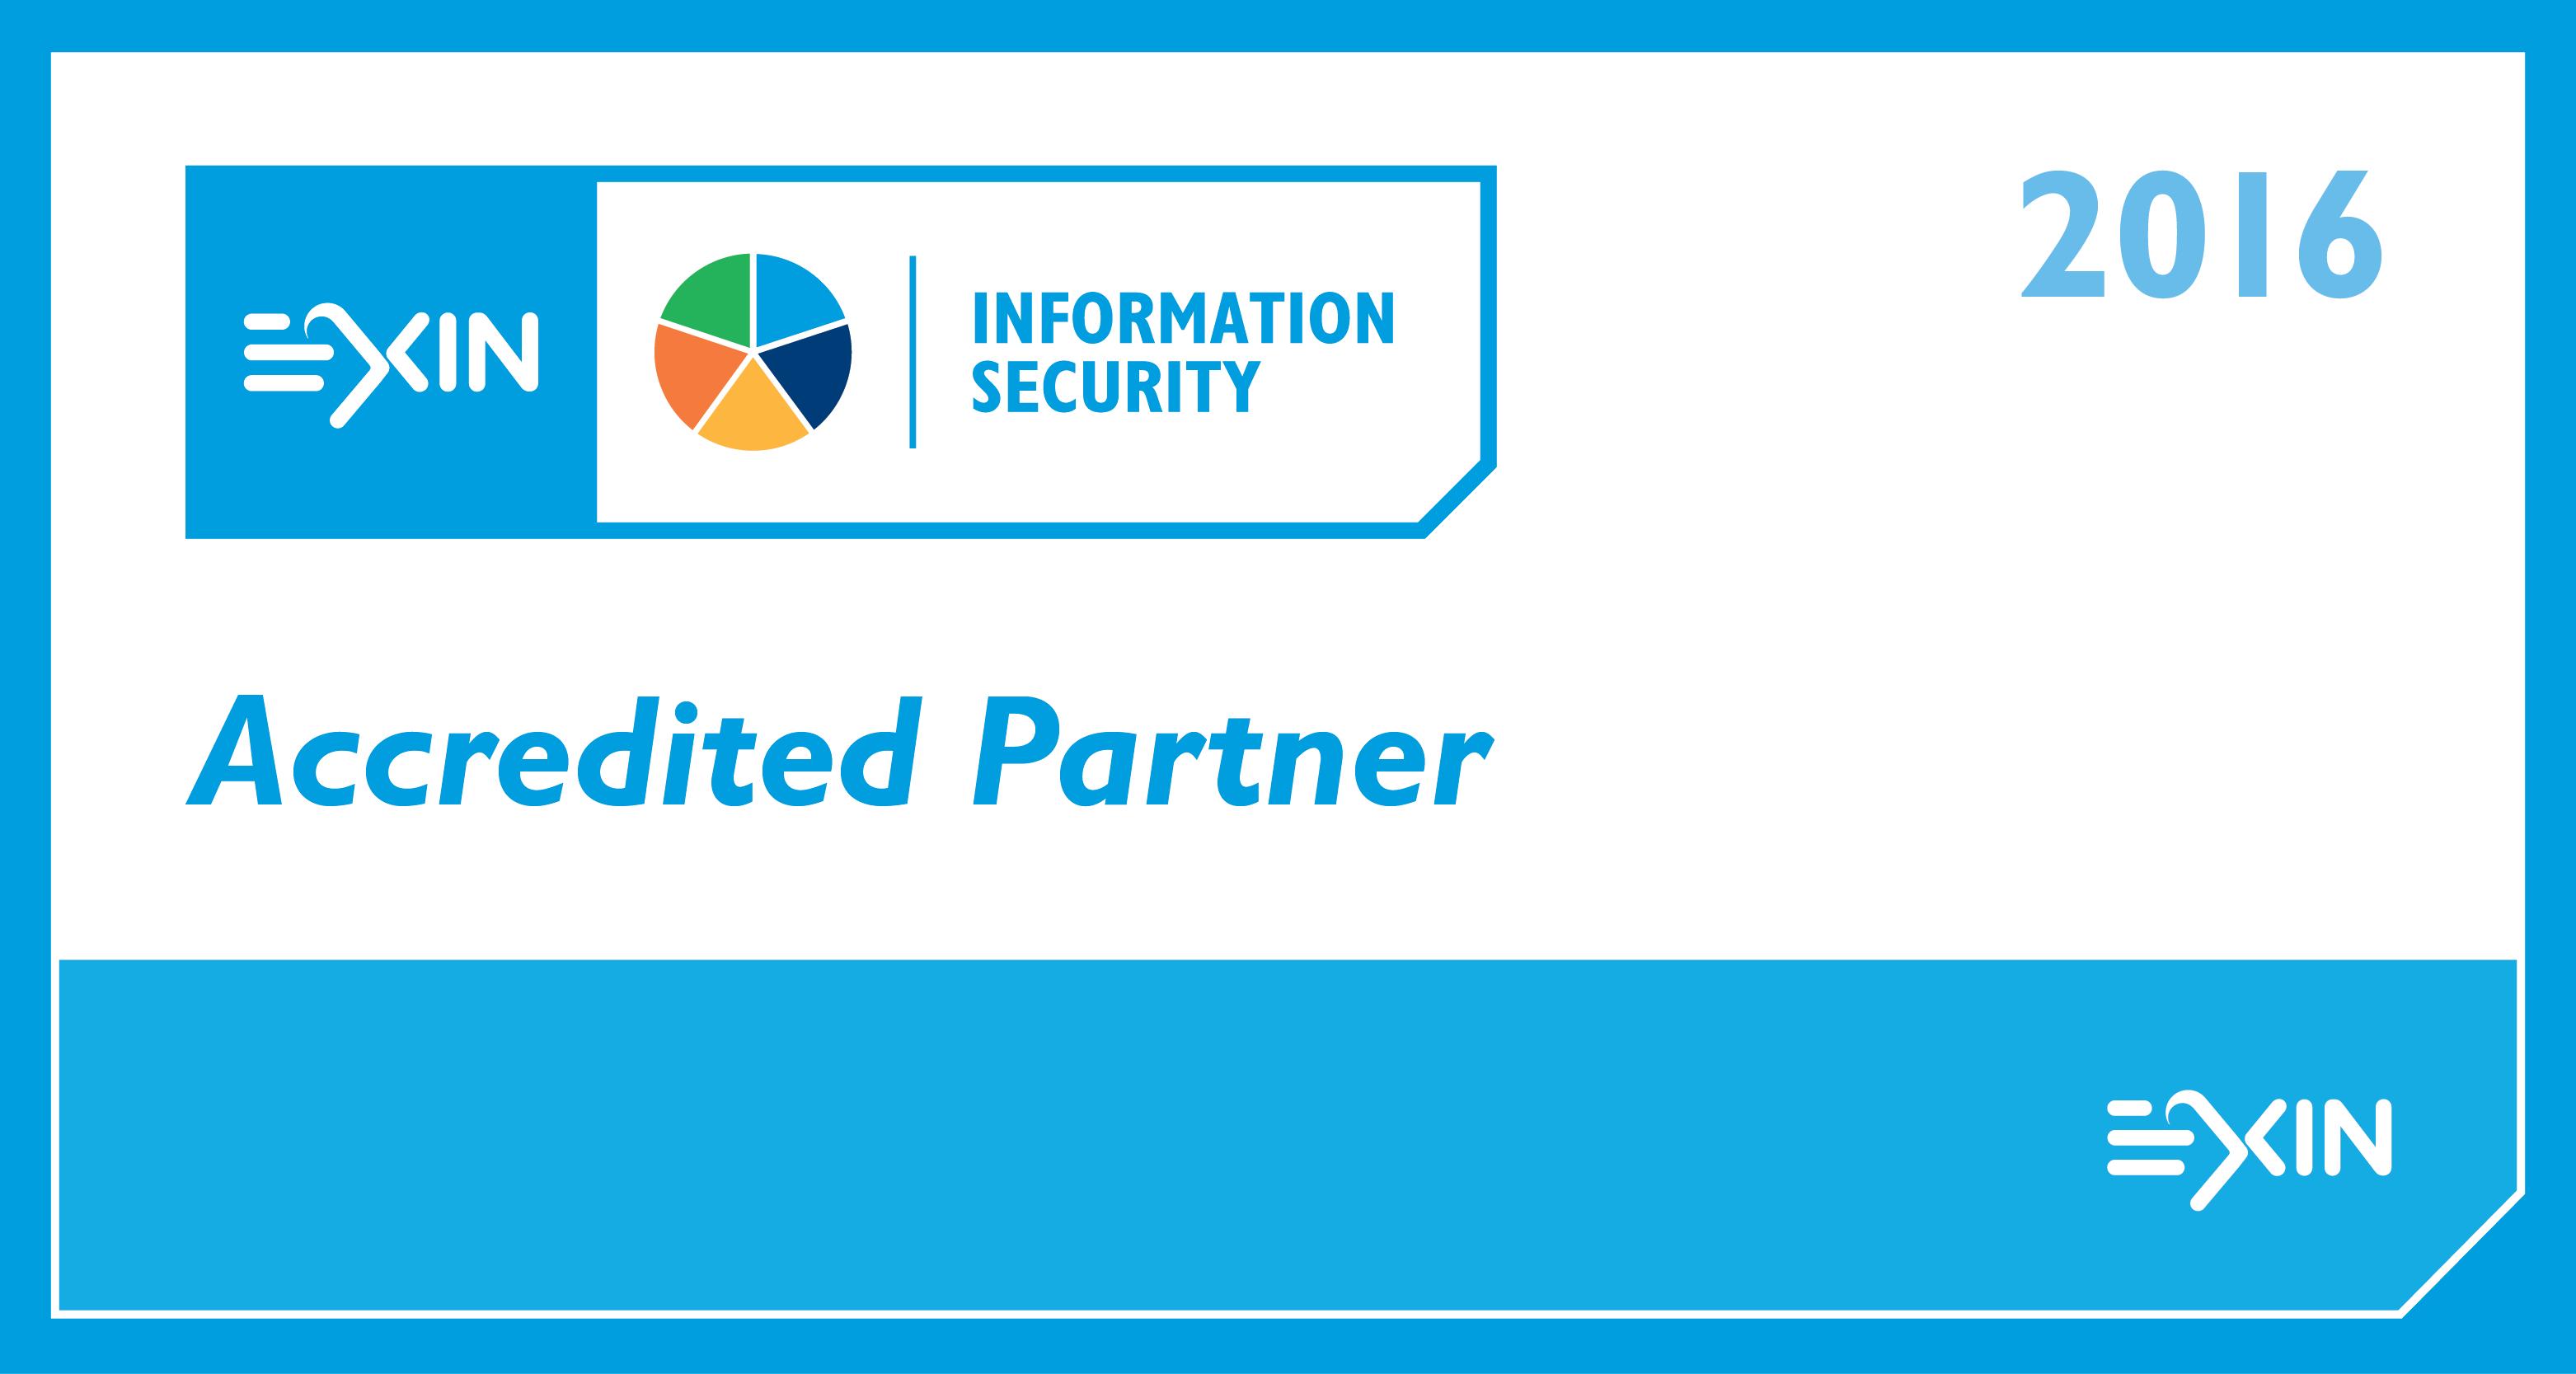 EXIN_INFORMATION_SECURITY